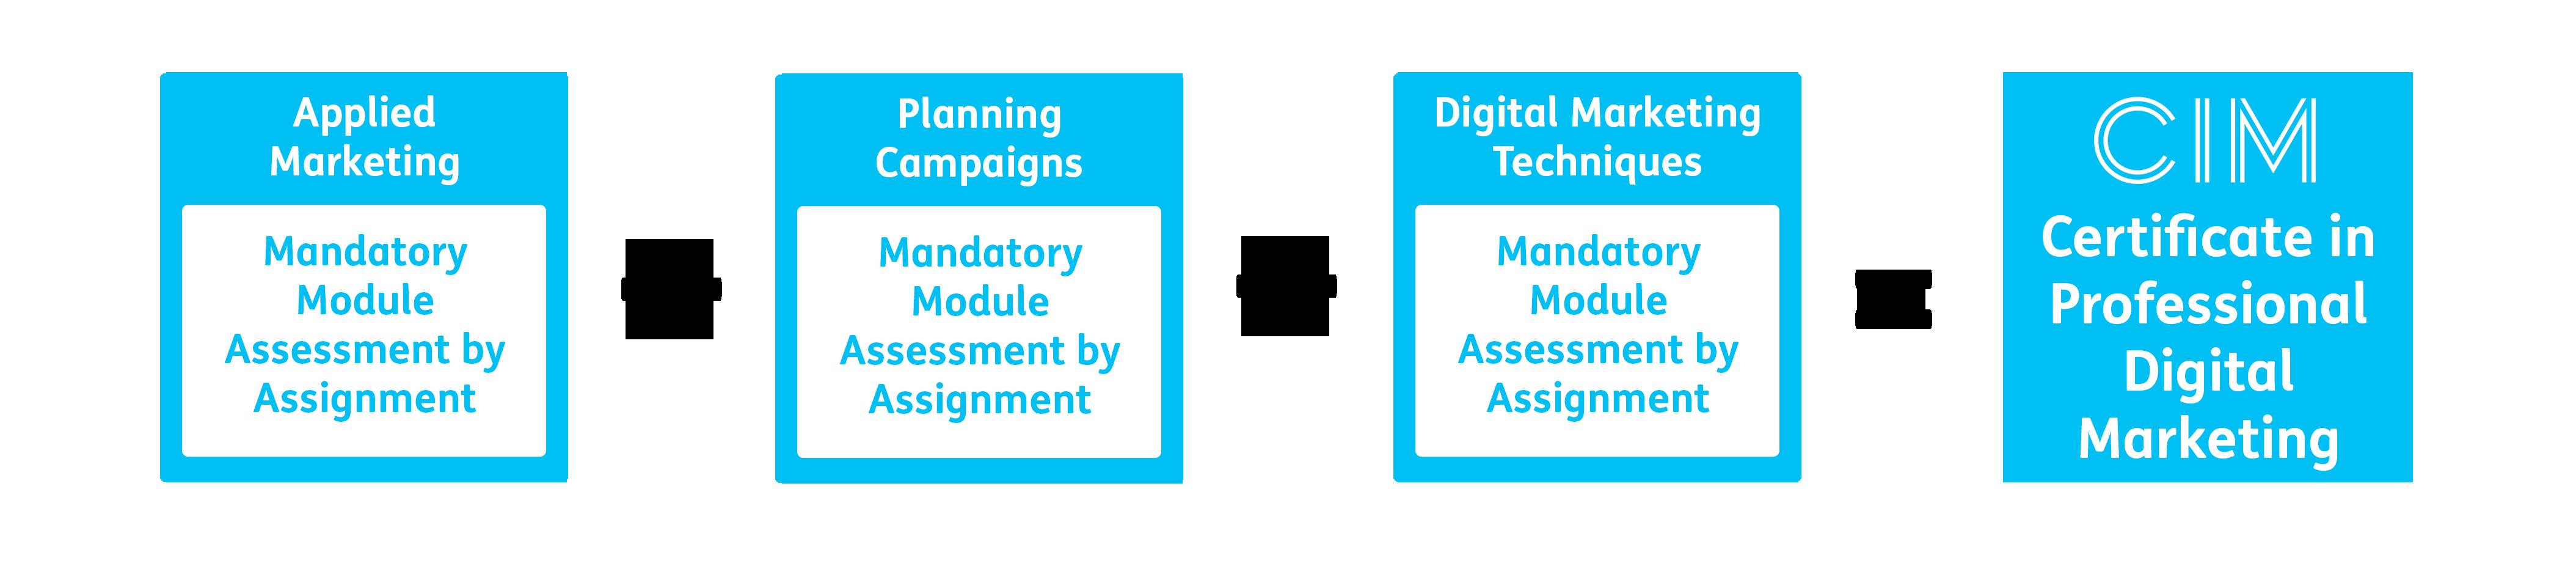 cim-certificate-in-professional-digital-marketing-level-4.png